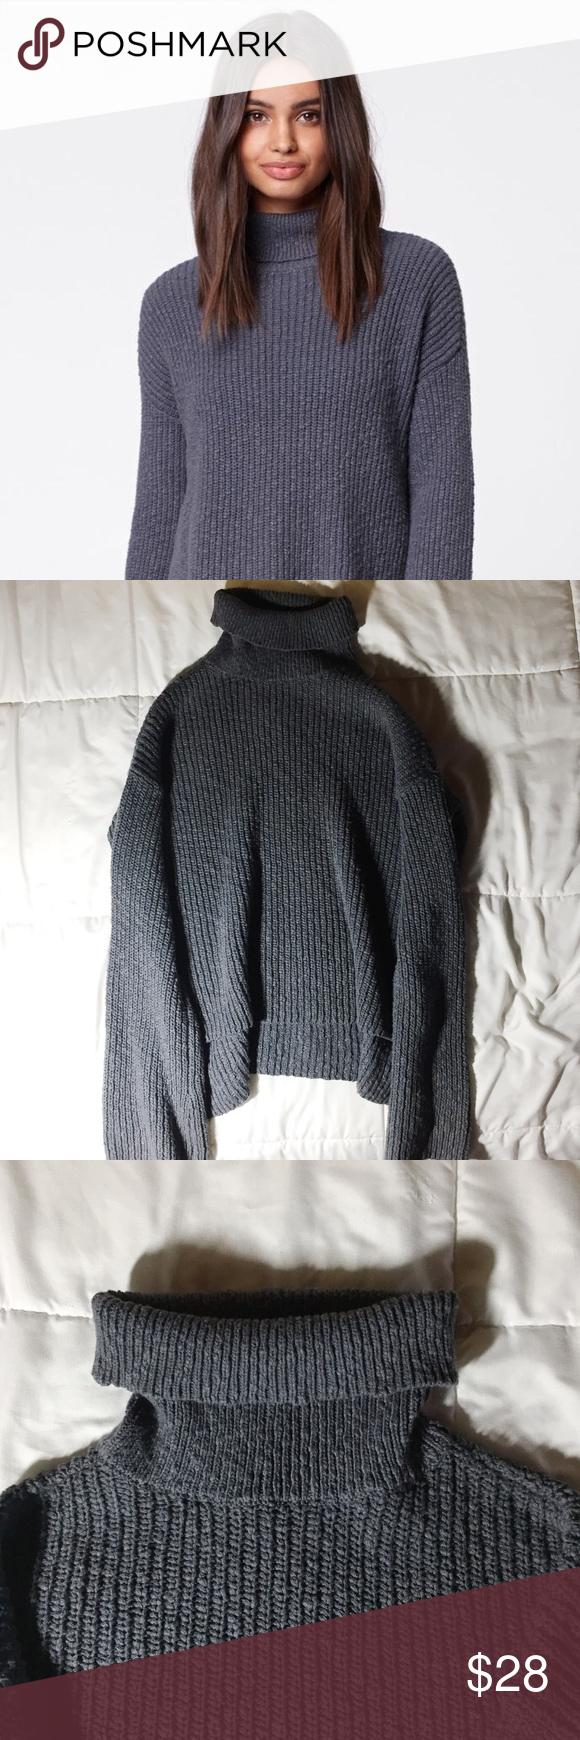 PacSun Slub Turtleneck Pullover Sweater | Pacsun, Fall season and ...